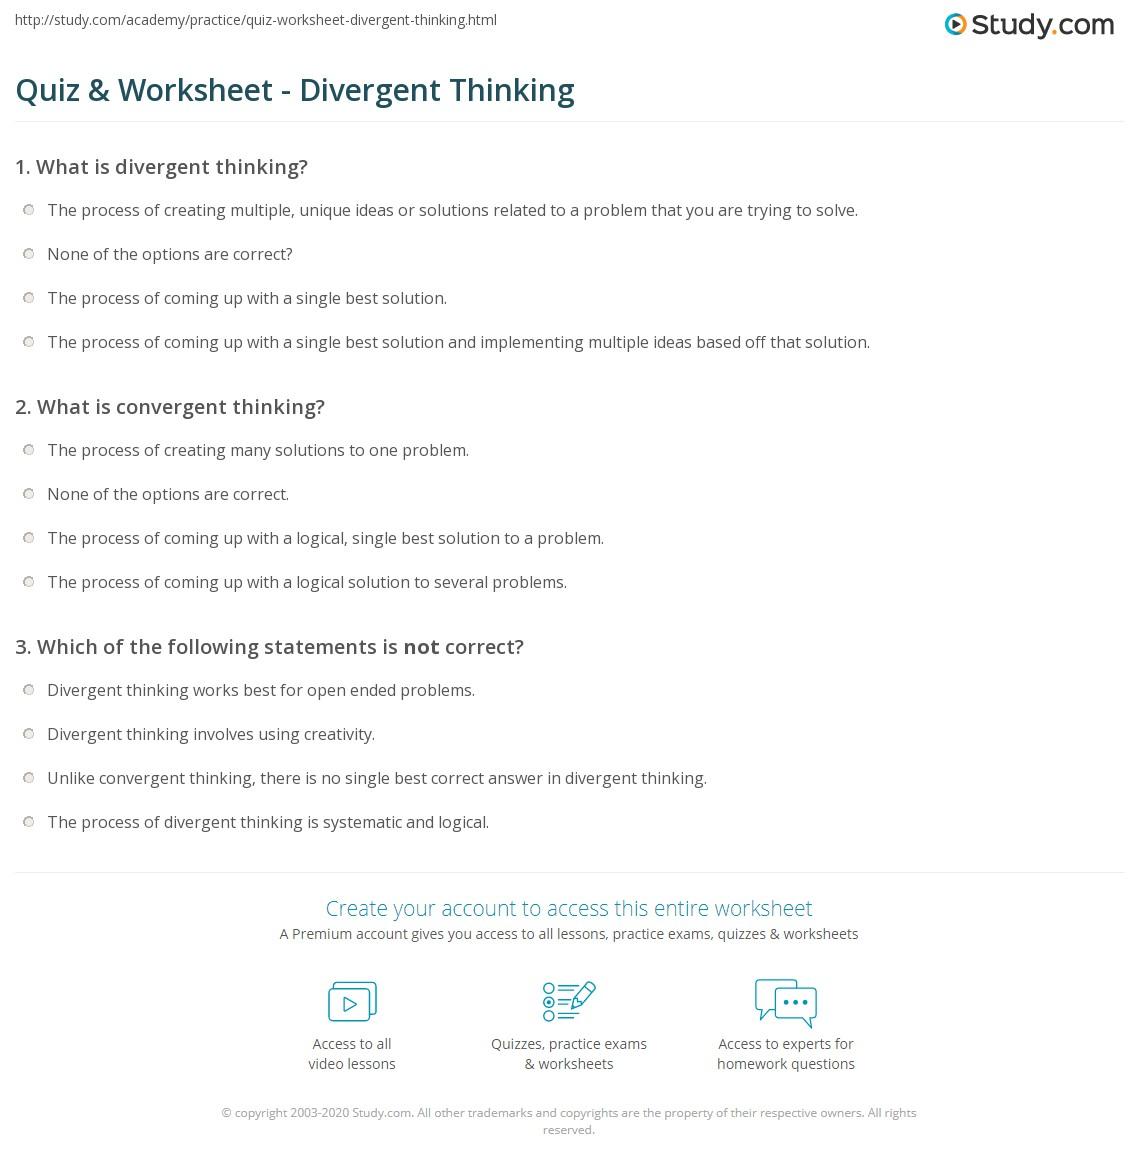 worksheet Criminal Thinking Worksheets workbooks looking and thinking worksheets free printable quiz worksheet divergent study com